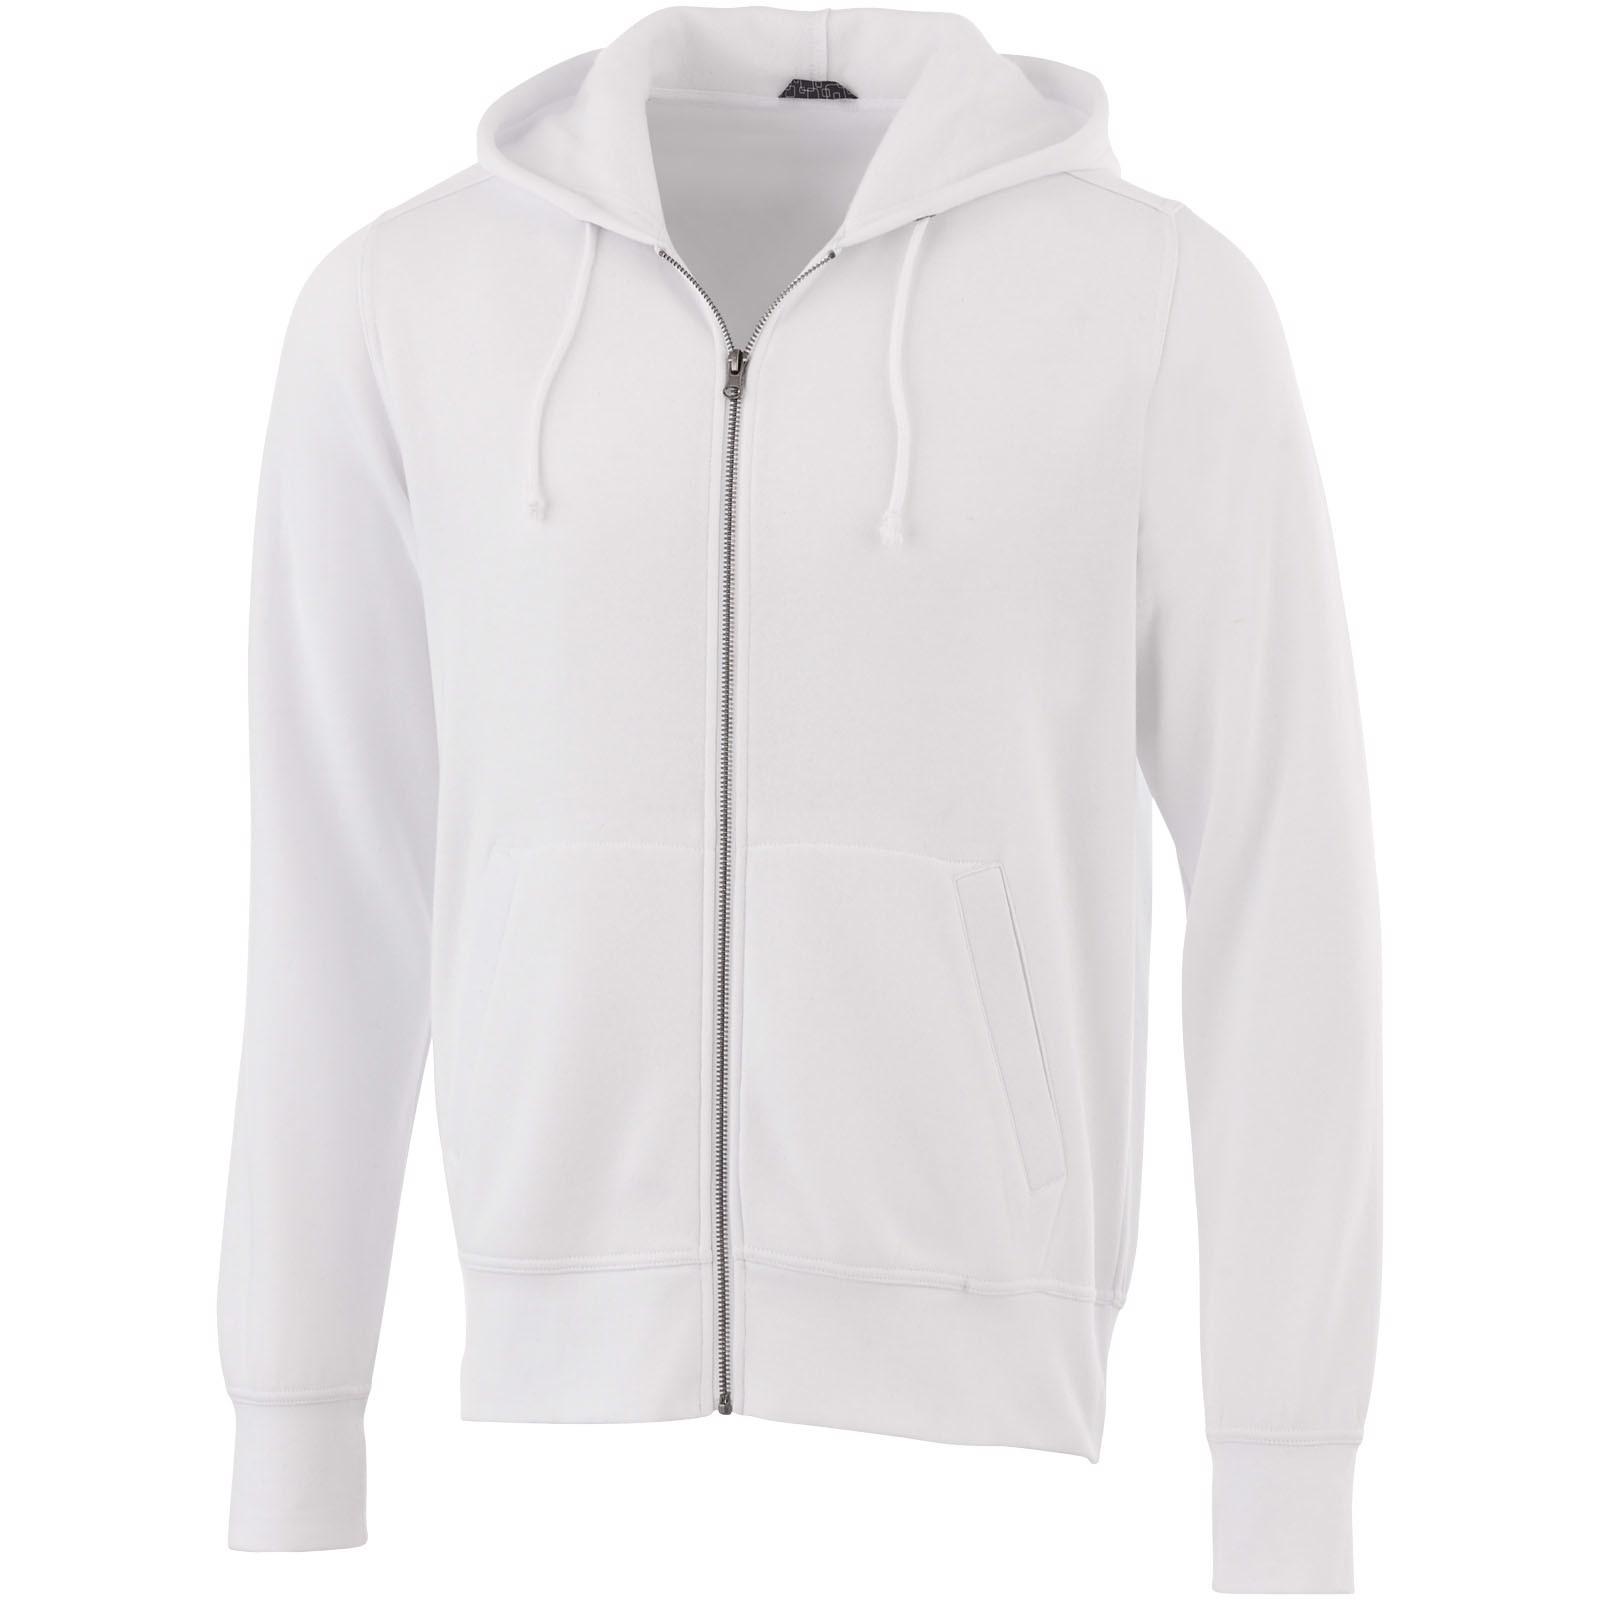 Cypress unisex full zip hoodie - White / M